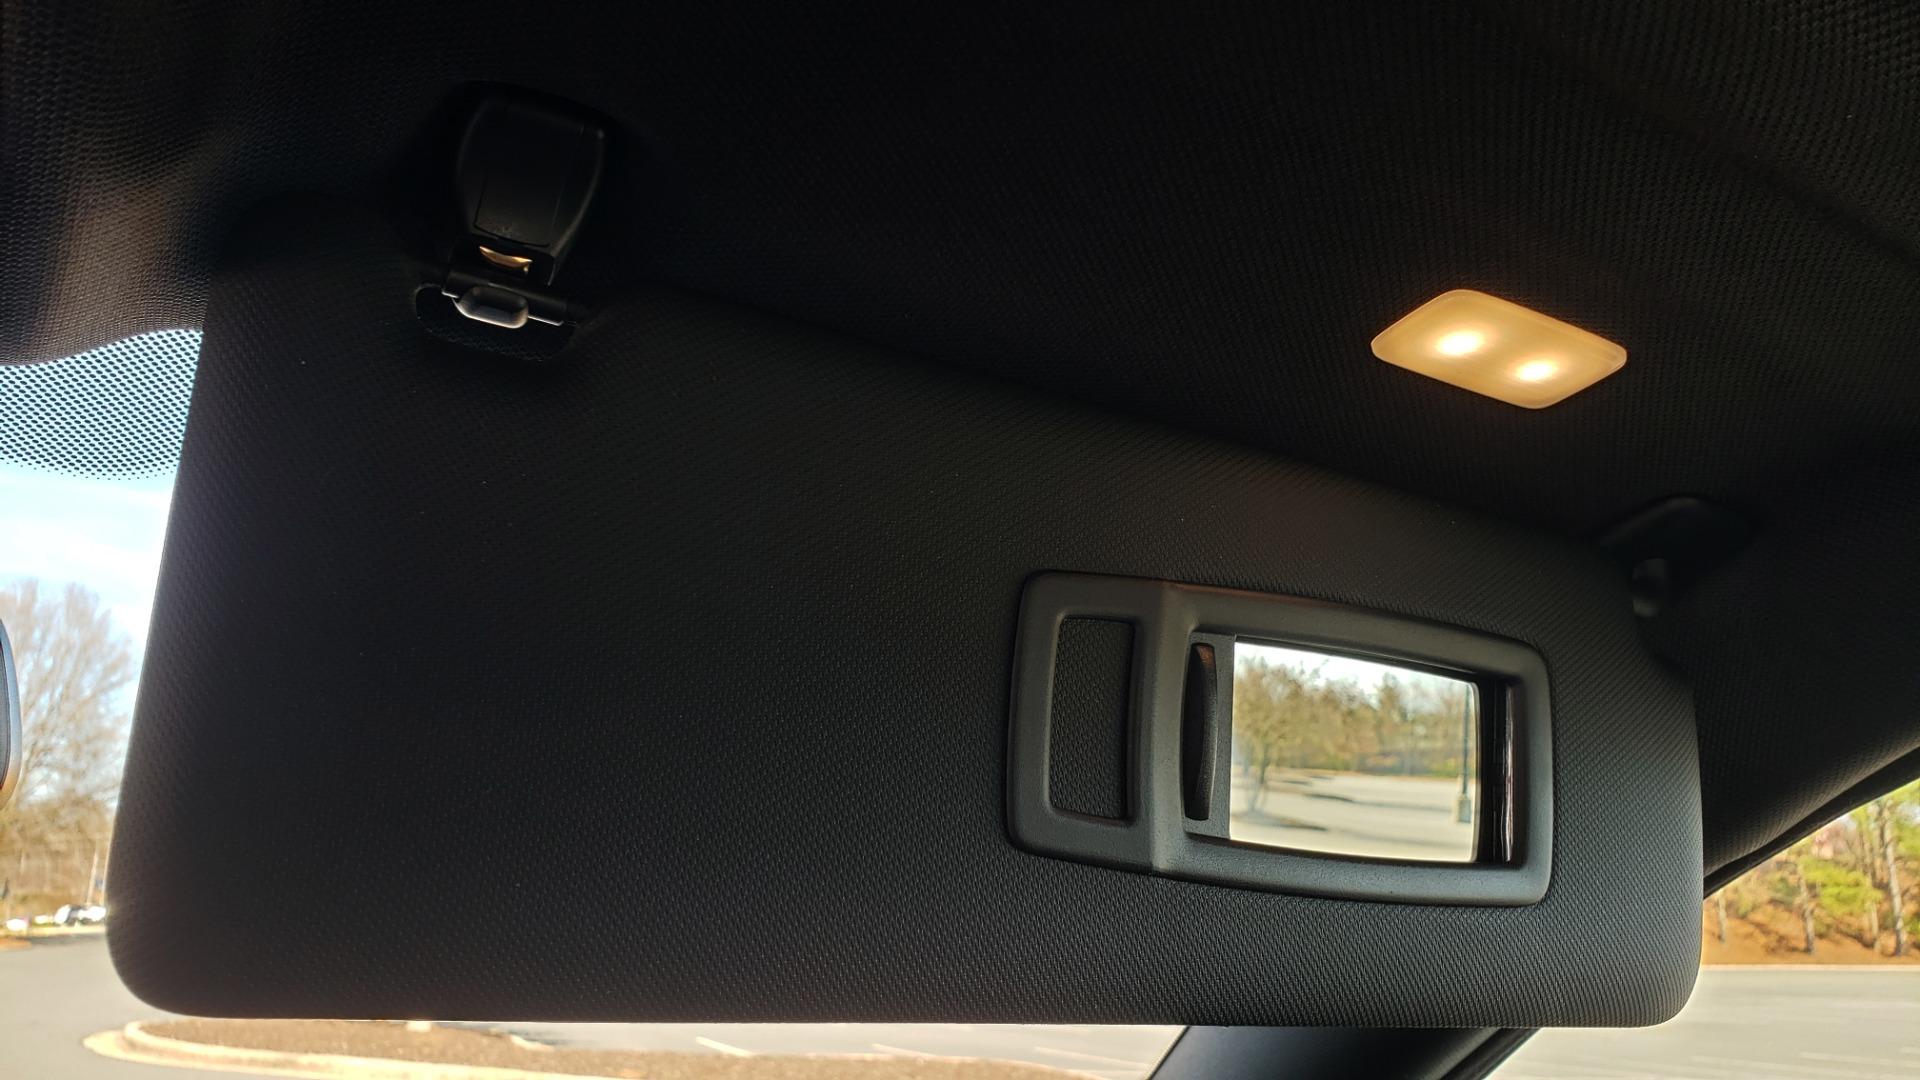 Used 2015 BMW M4 COUPE / EXEC PKG / DRVR ASST PLUS / LIGHTING / M-SUSPENSION for sale Sold at Formula Imports in Charlotte NC 28227 61